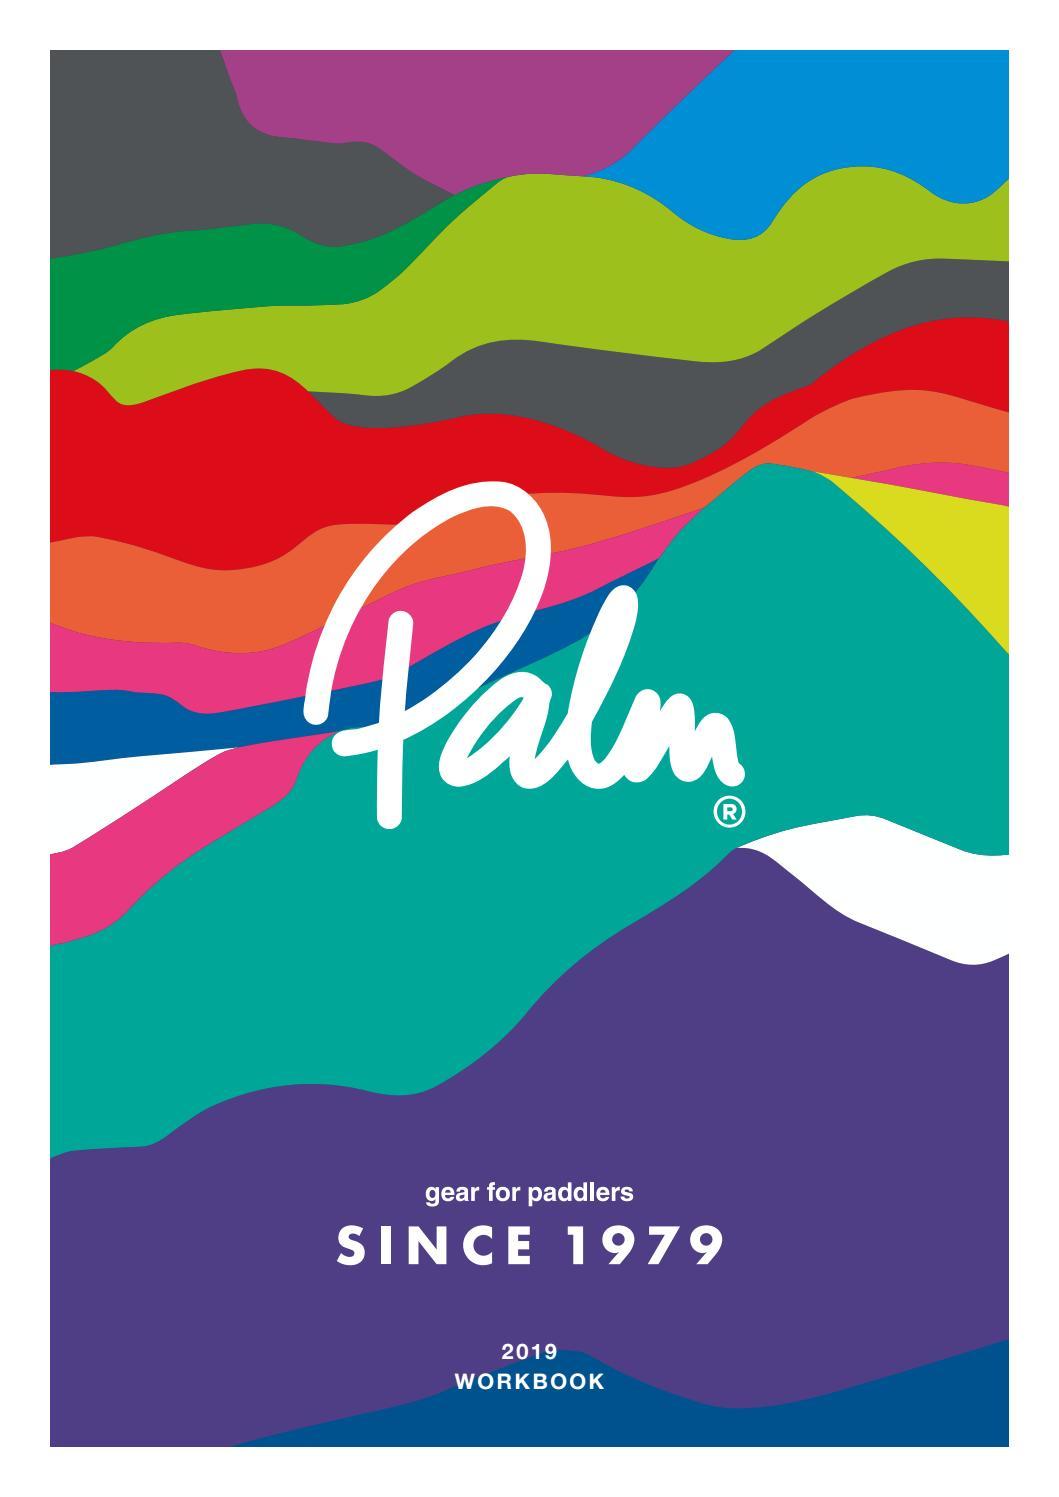 4d706747b7 2019 Palm workbook EN by Palm Equipment - issuu